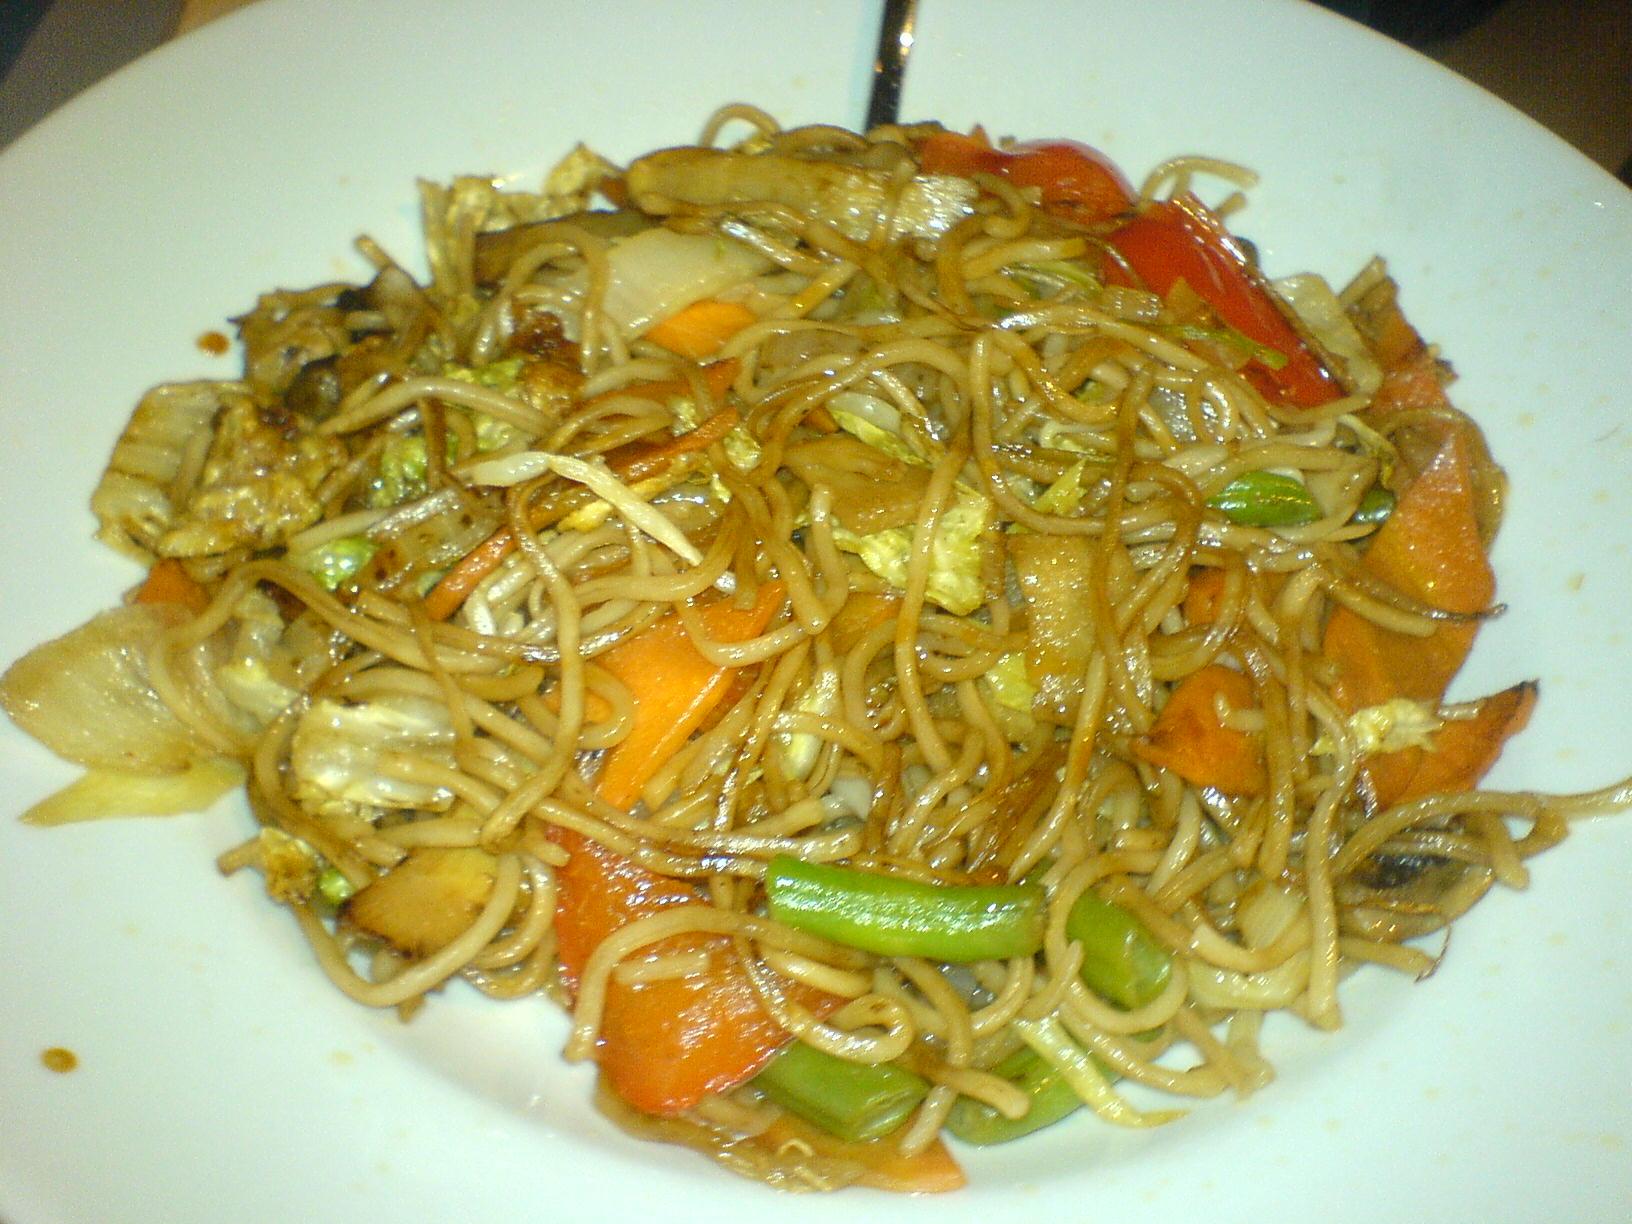 http://foodloader.net/Holz_2009-02-13_Asianudeln.jpg